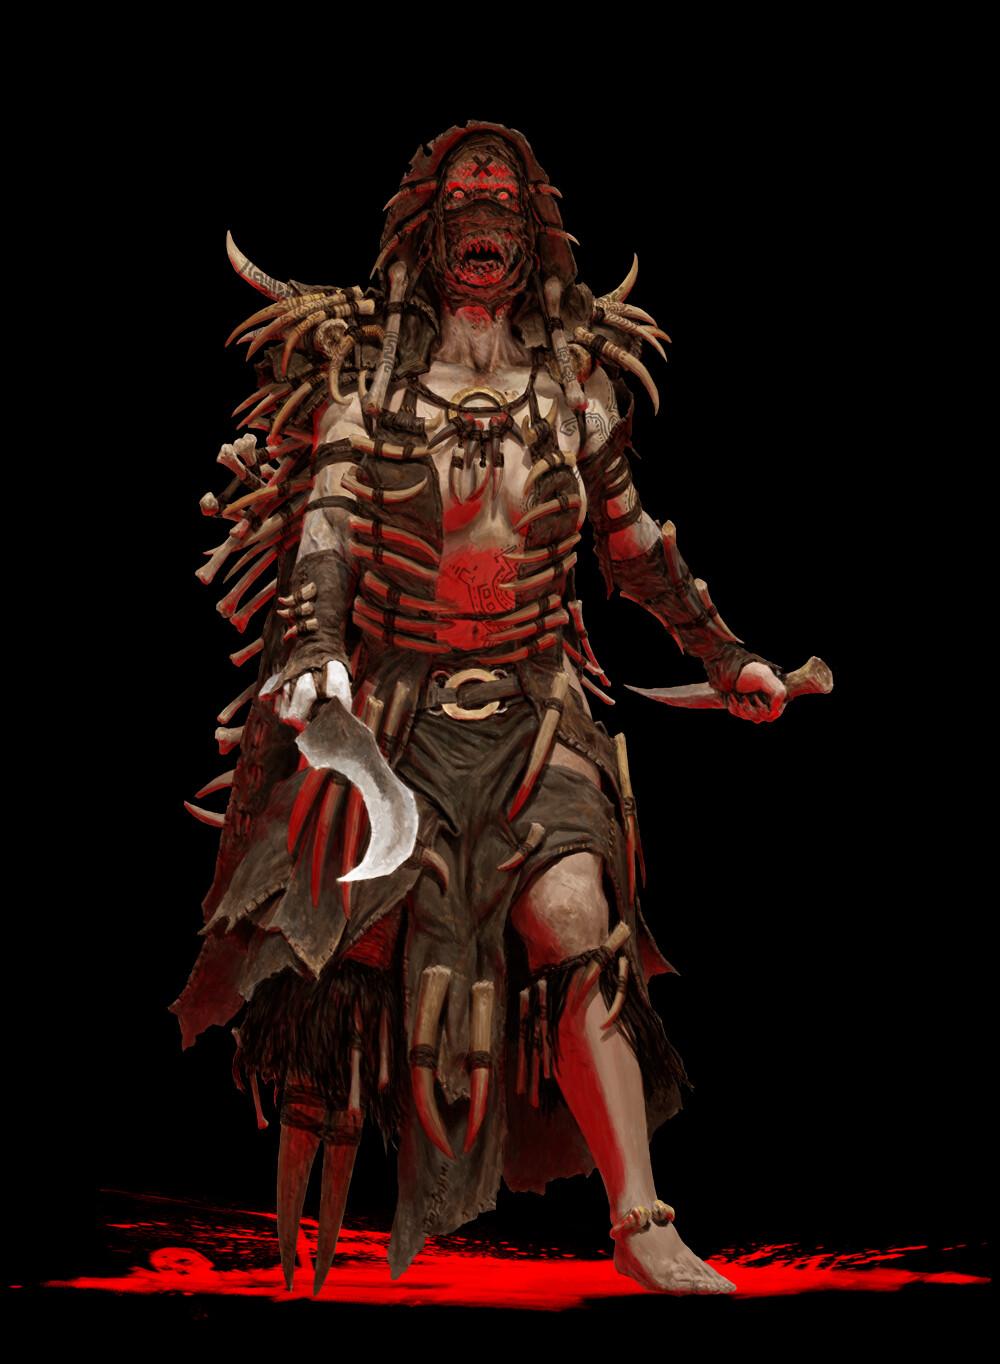 Adrian smith tribe 6 shaman coloured